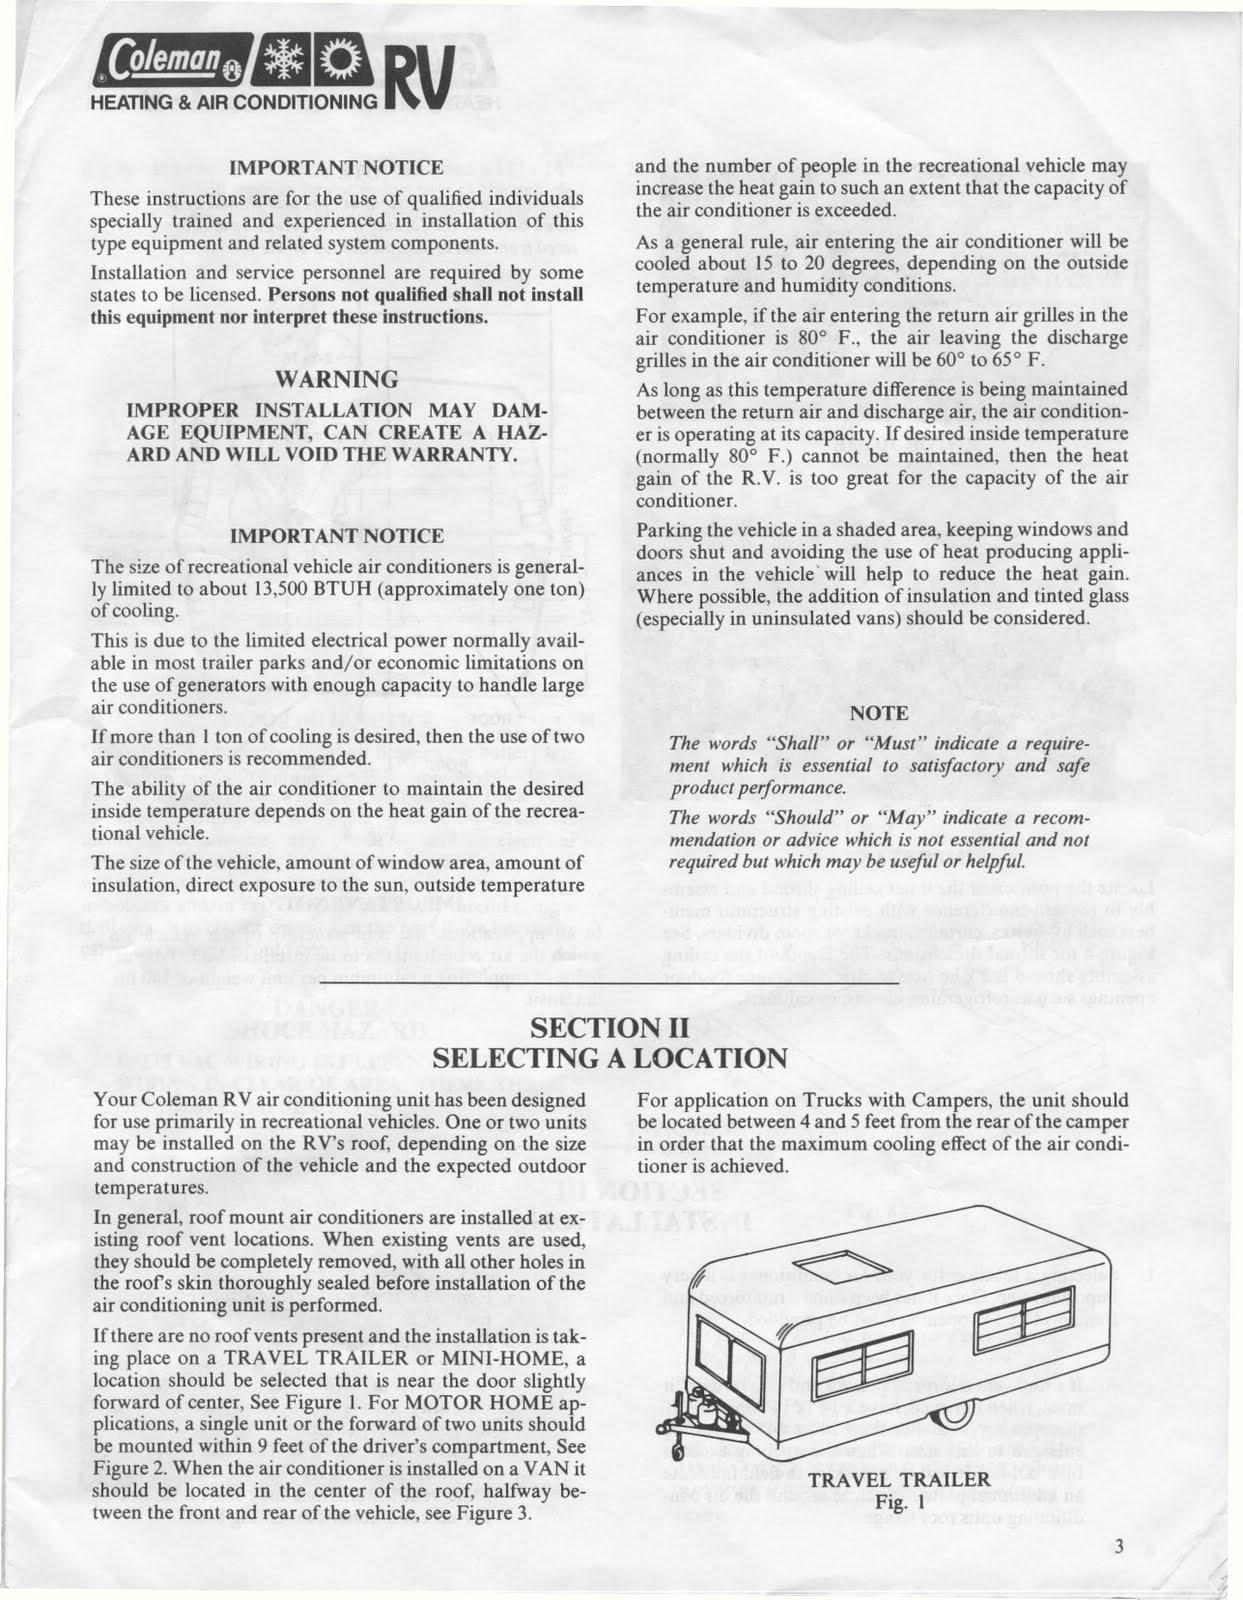 Coleman ac Service manual